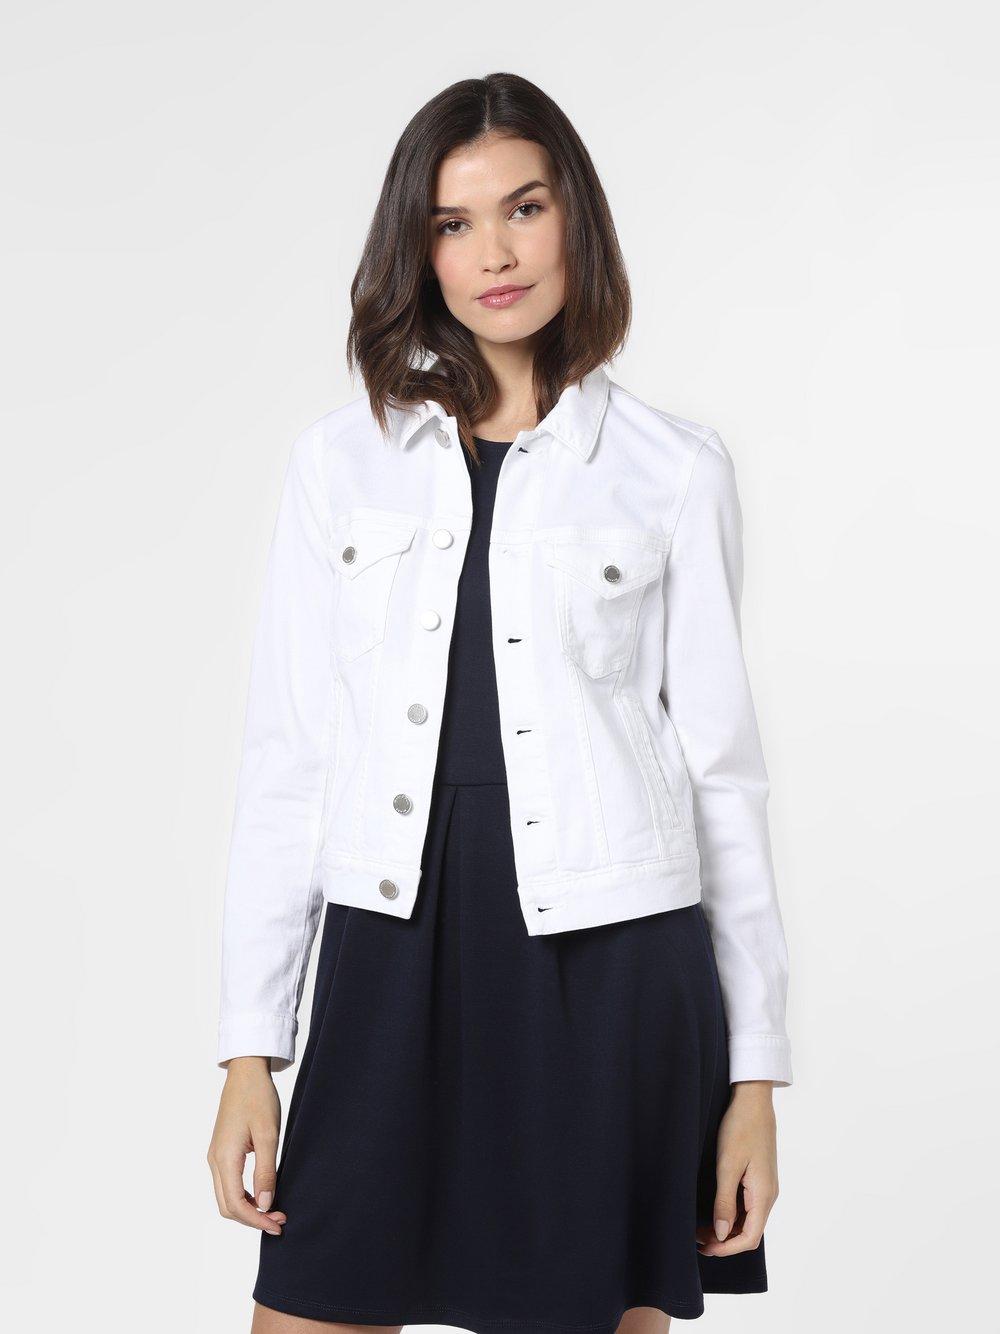 Marc O'Polo Denim – Damska kurtka jeansowa, biały Van Graaf 486985-0001-09940